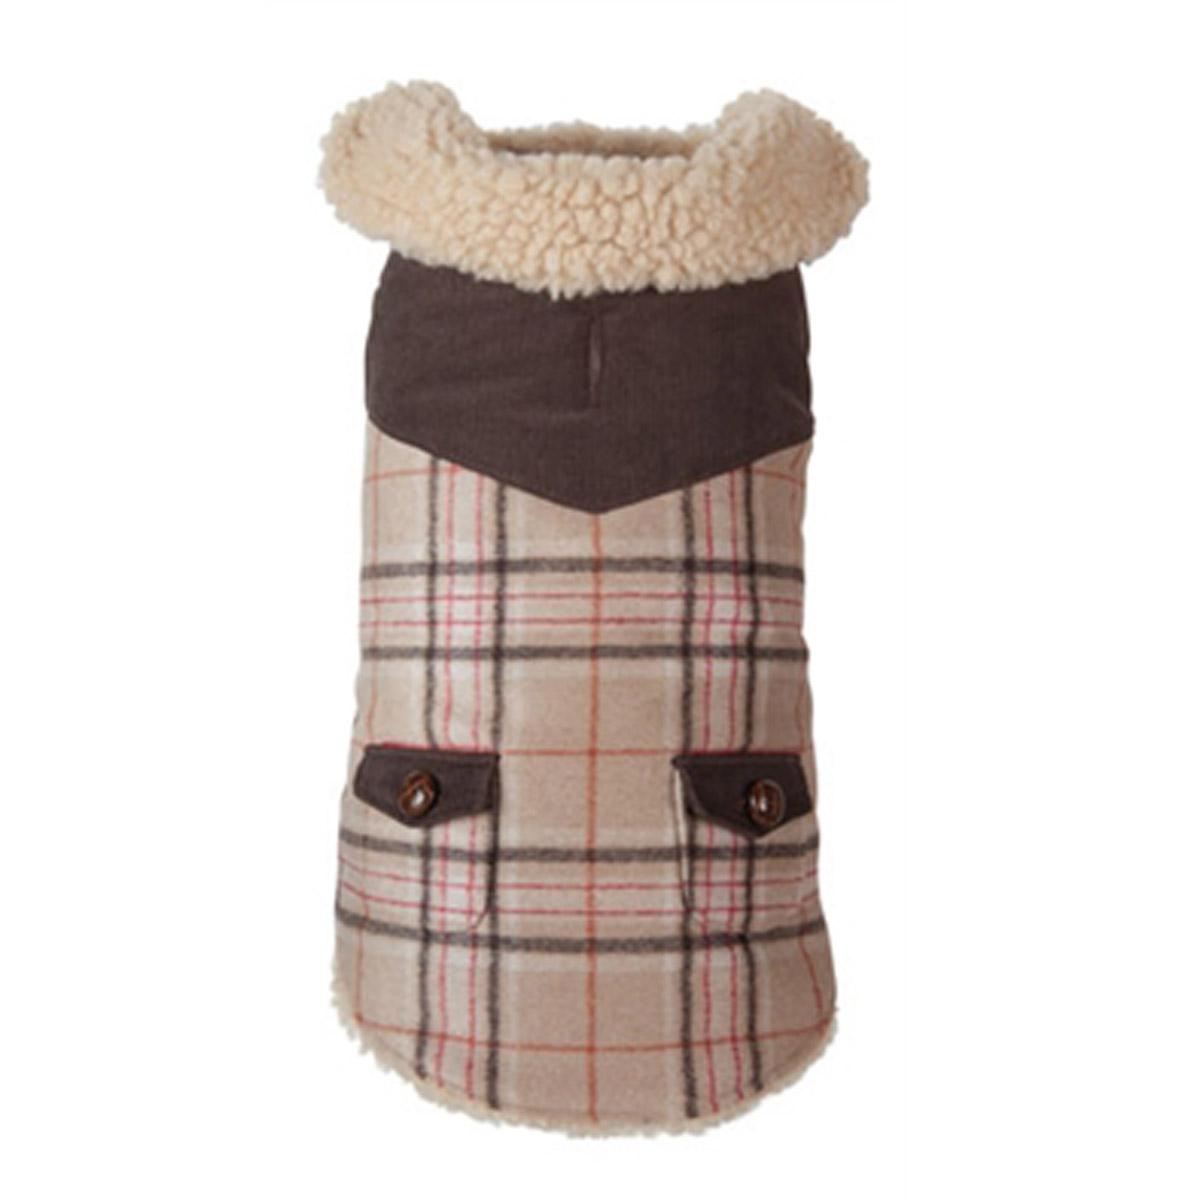 fabdog® Wool Plaid Shearling Dog Jacket - Camel